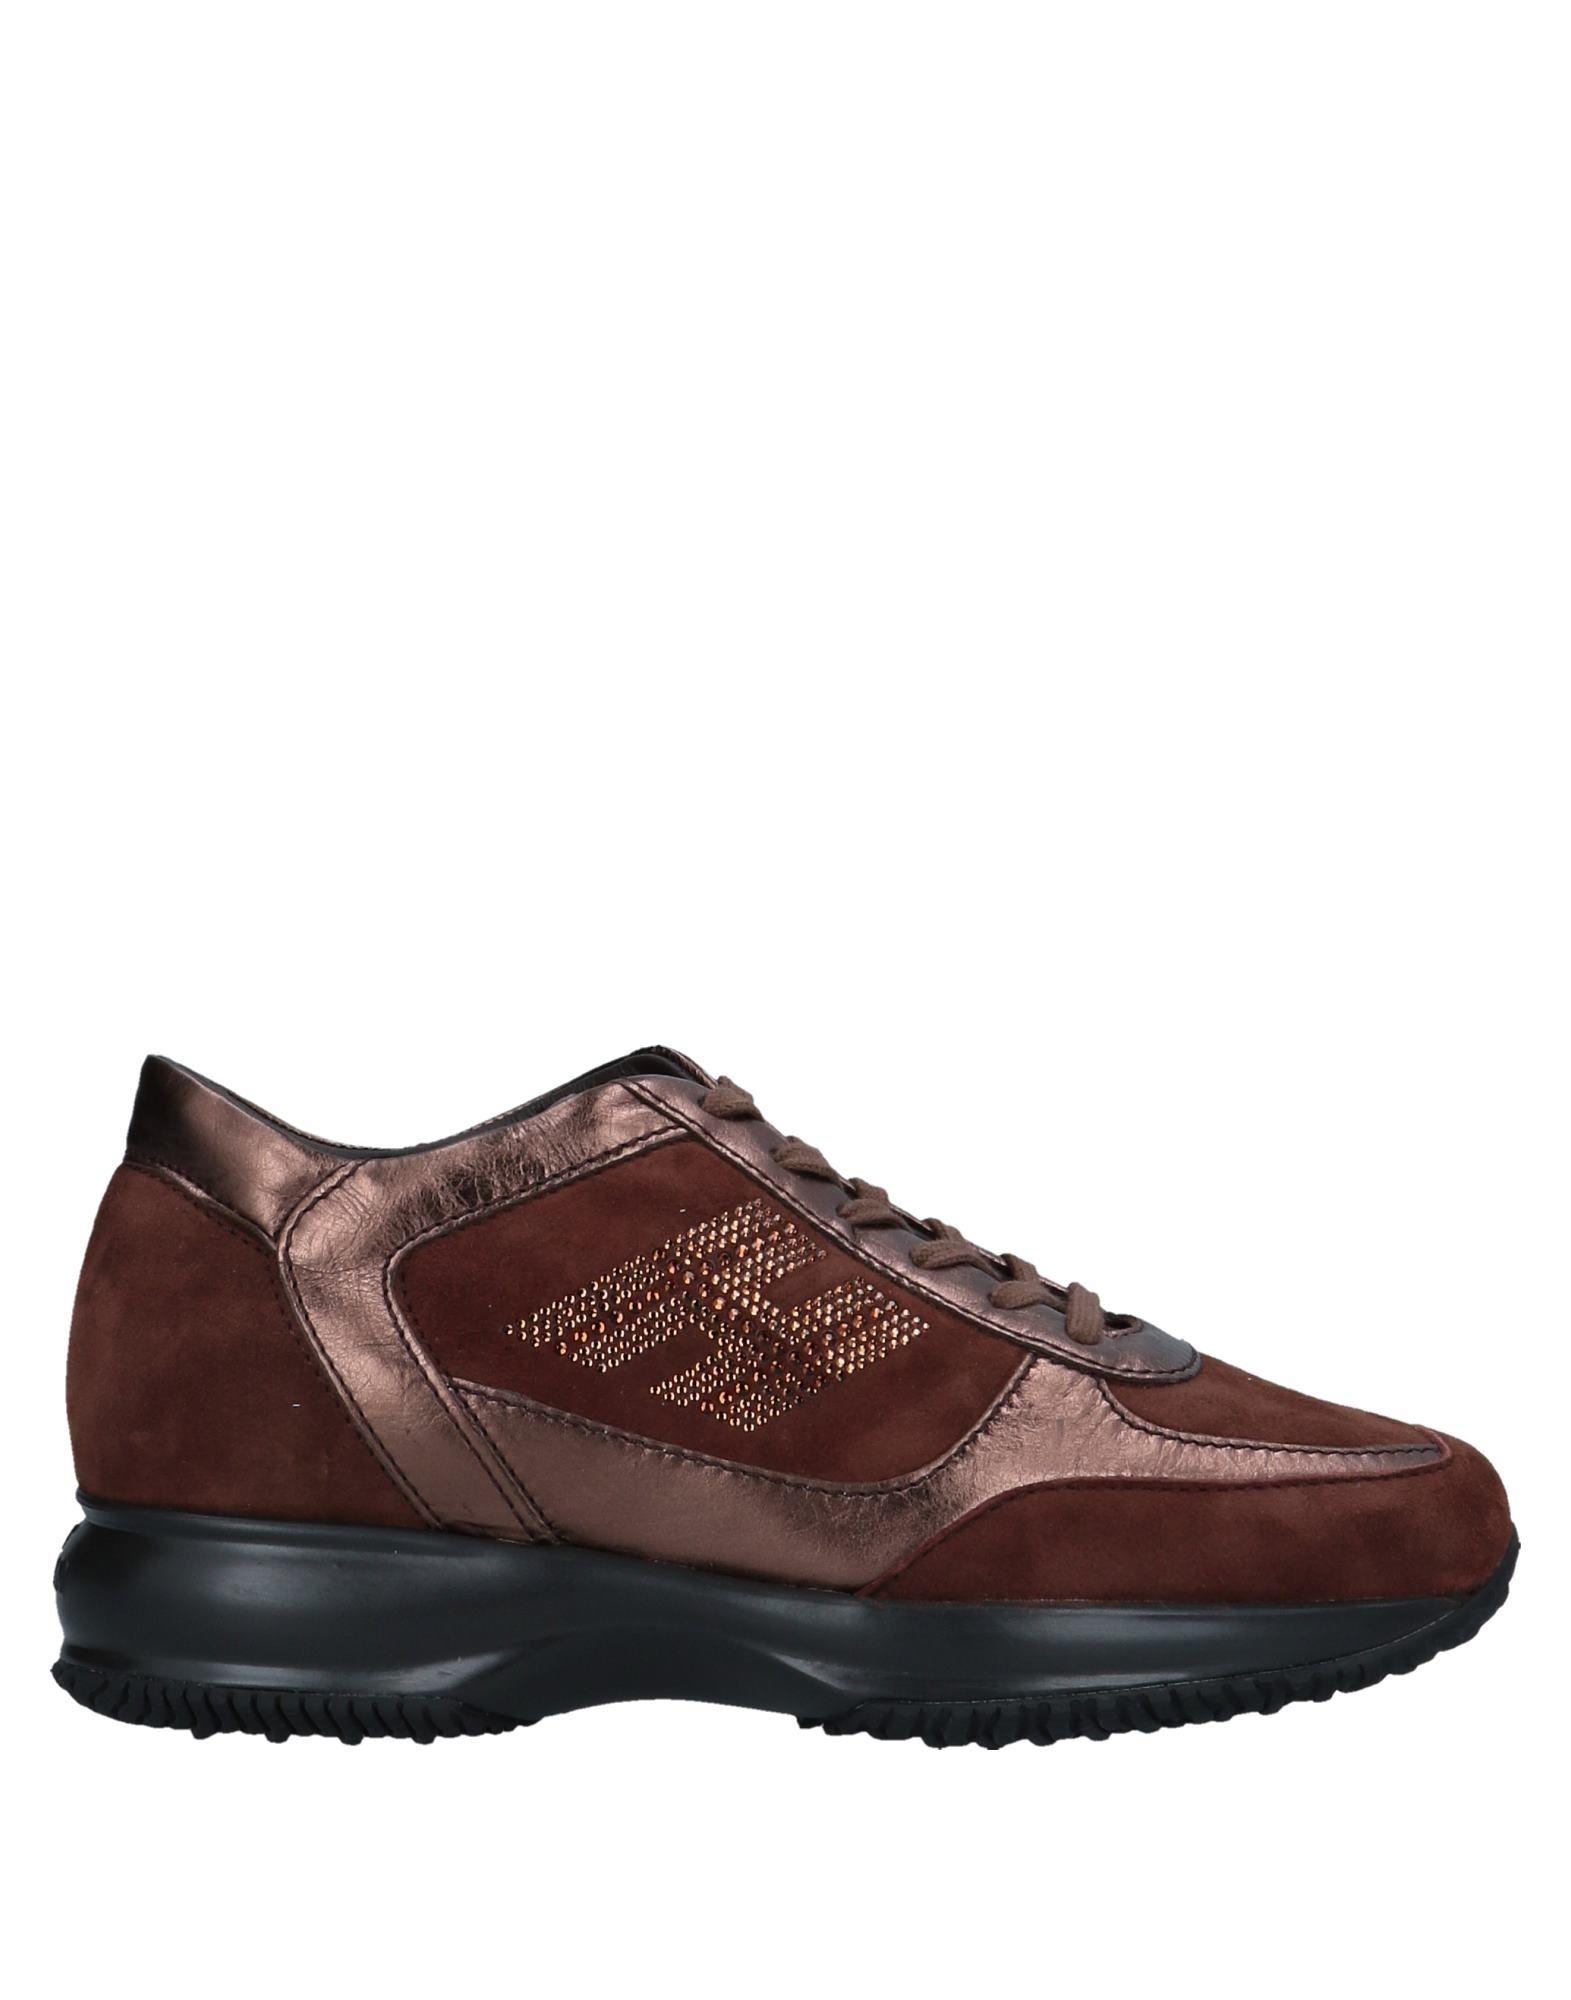 Moda Sneakers Hogan Donna - 11288924NR